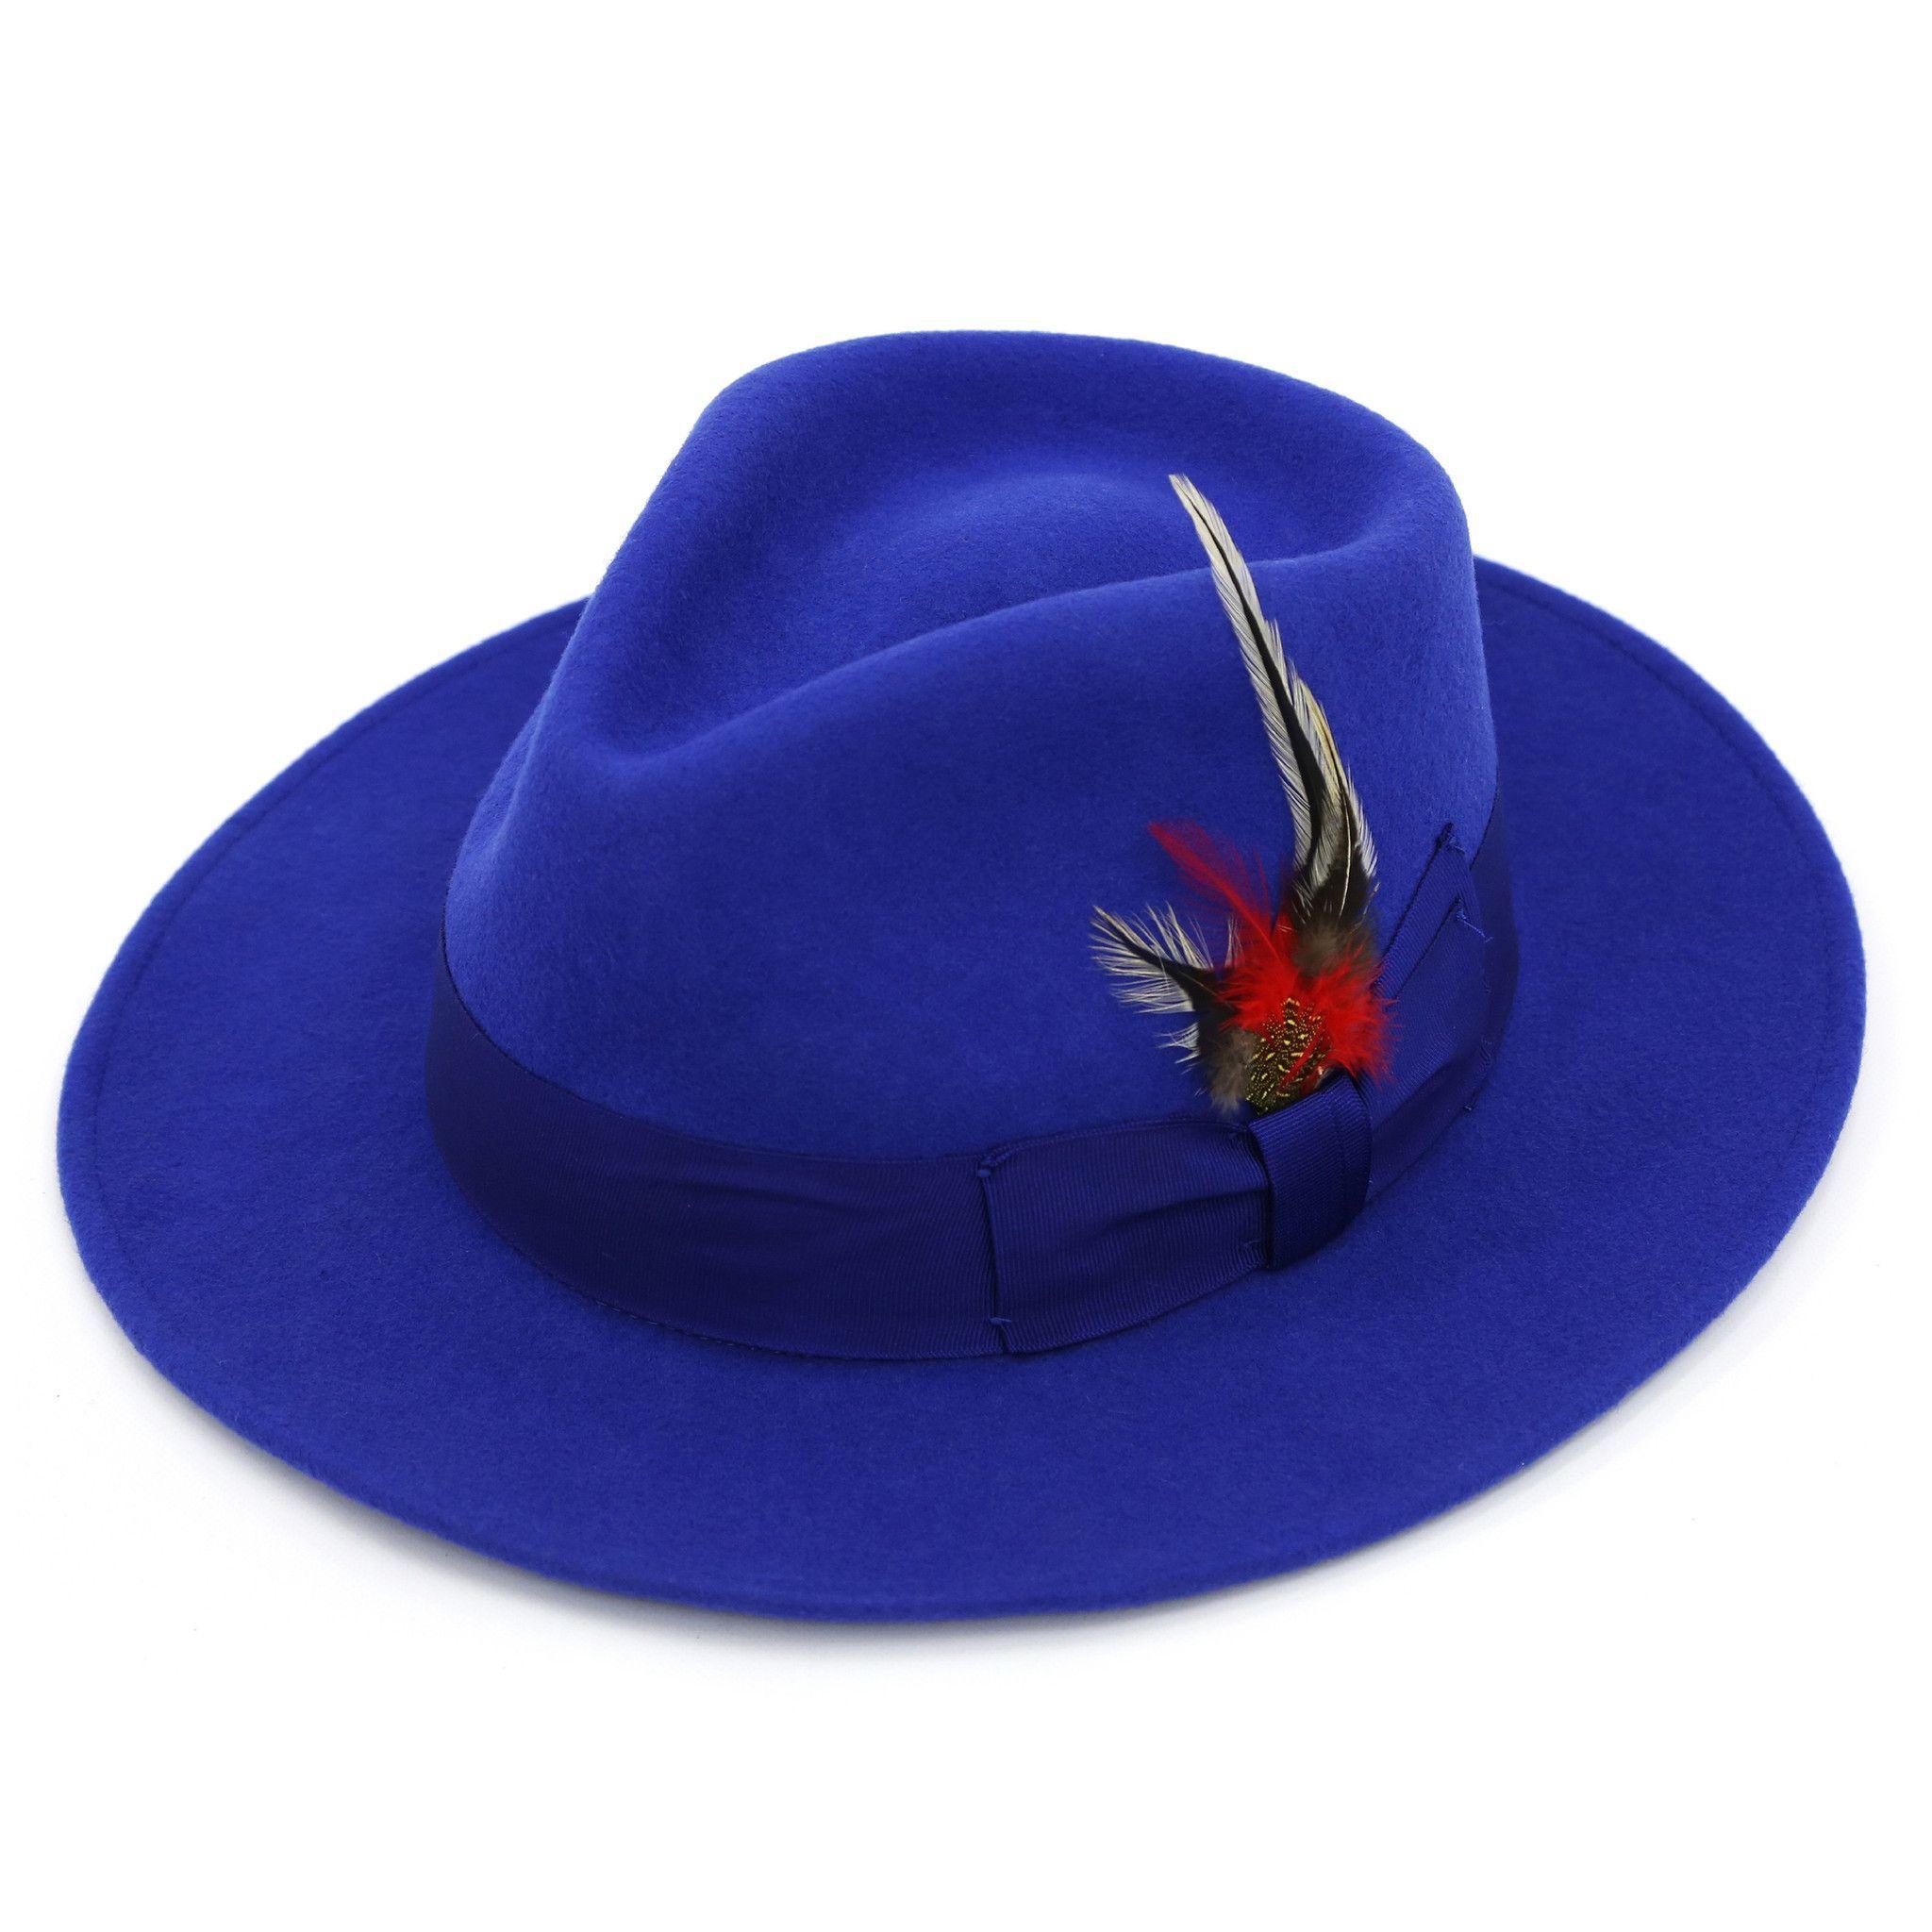 Ferrecci Crushable Fedora Hat 100/% Wool